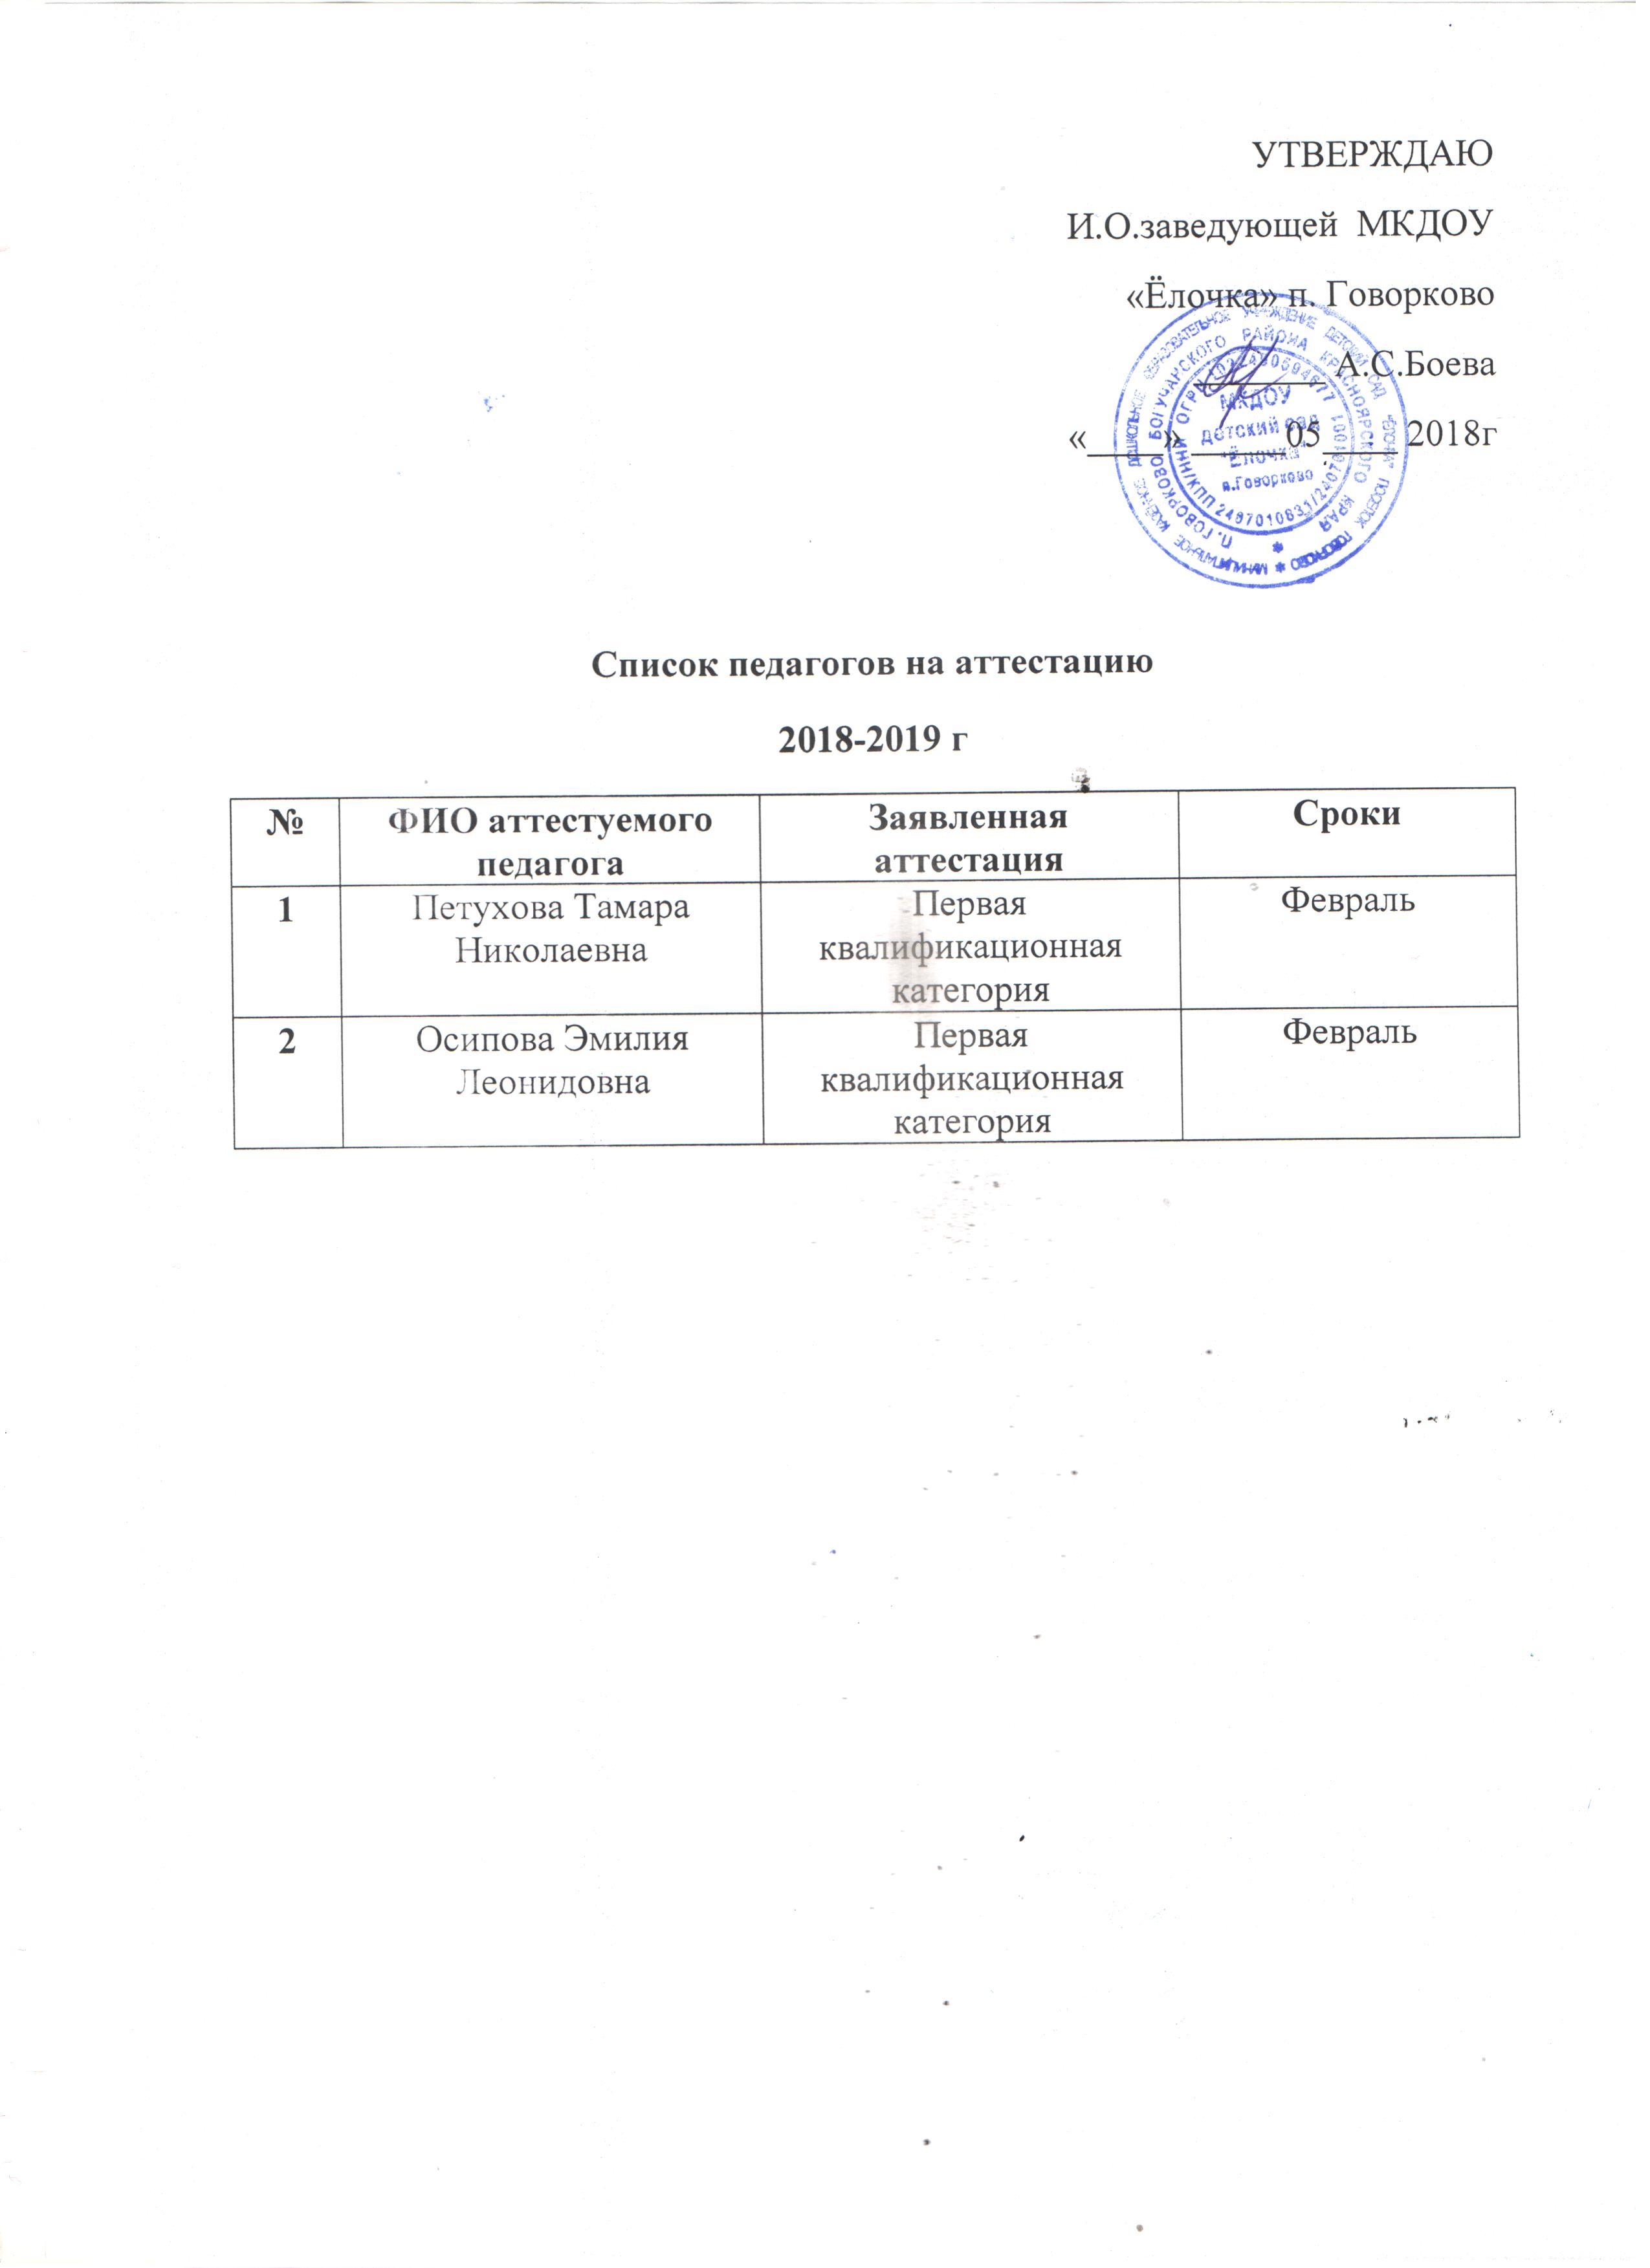 Список педагогов на аттестацию 2018-2019 г